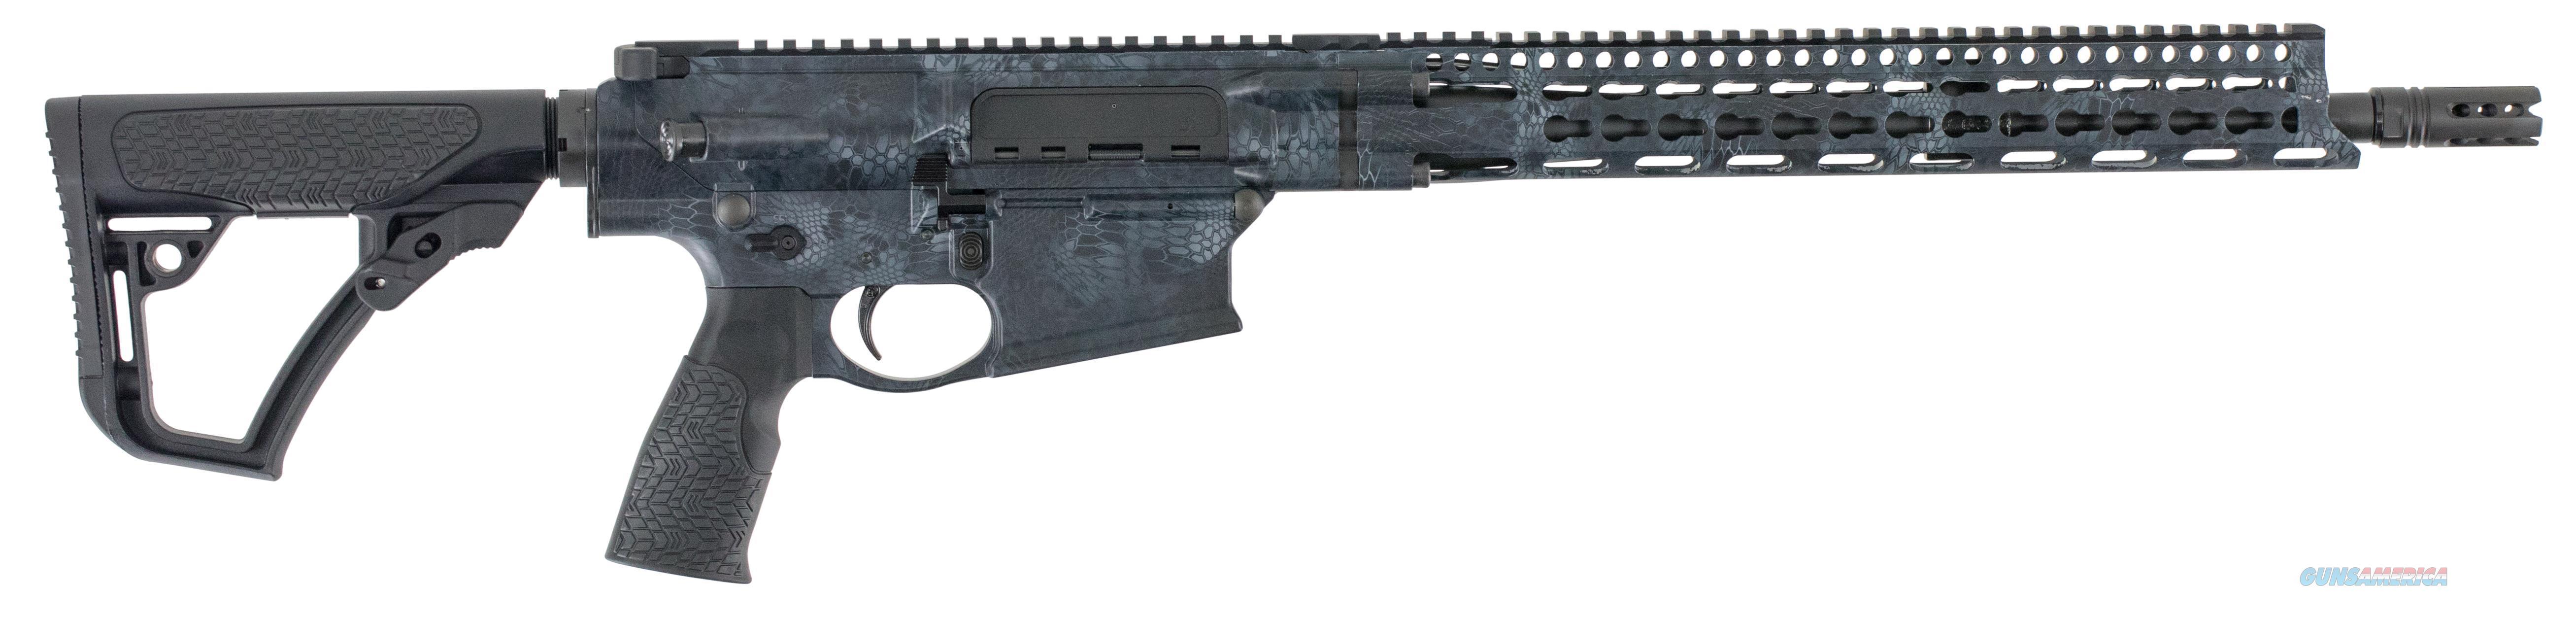 Daniel Defense Dd5v1 Kryptek Typhon 7.62X51mm 02-150-06037-047  Guns > Rifles > D Misc Rifles